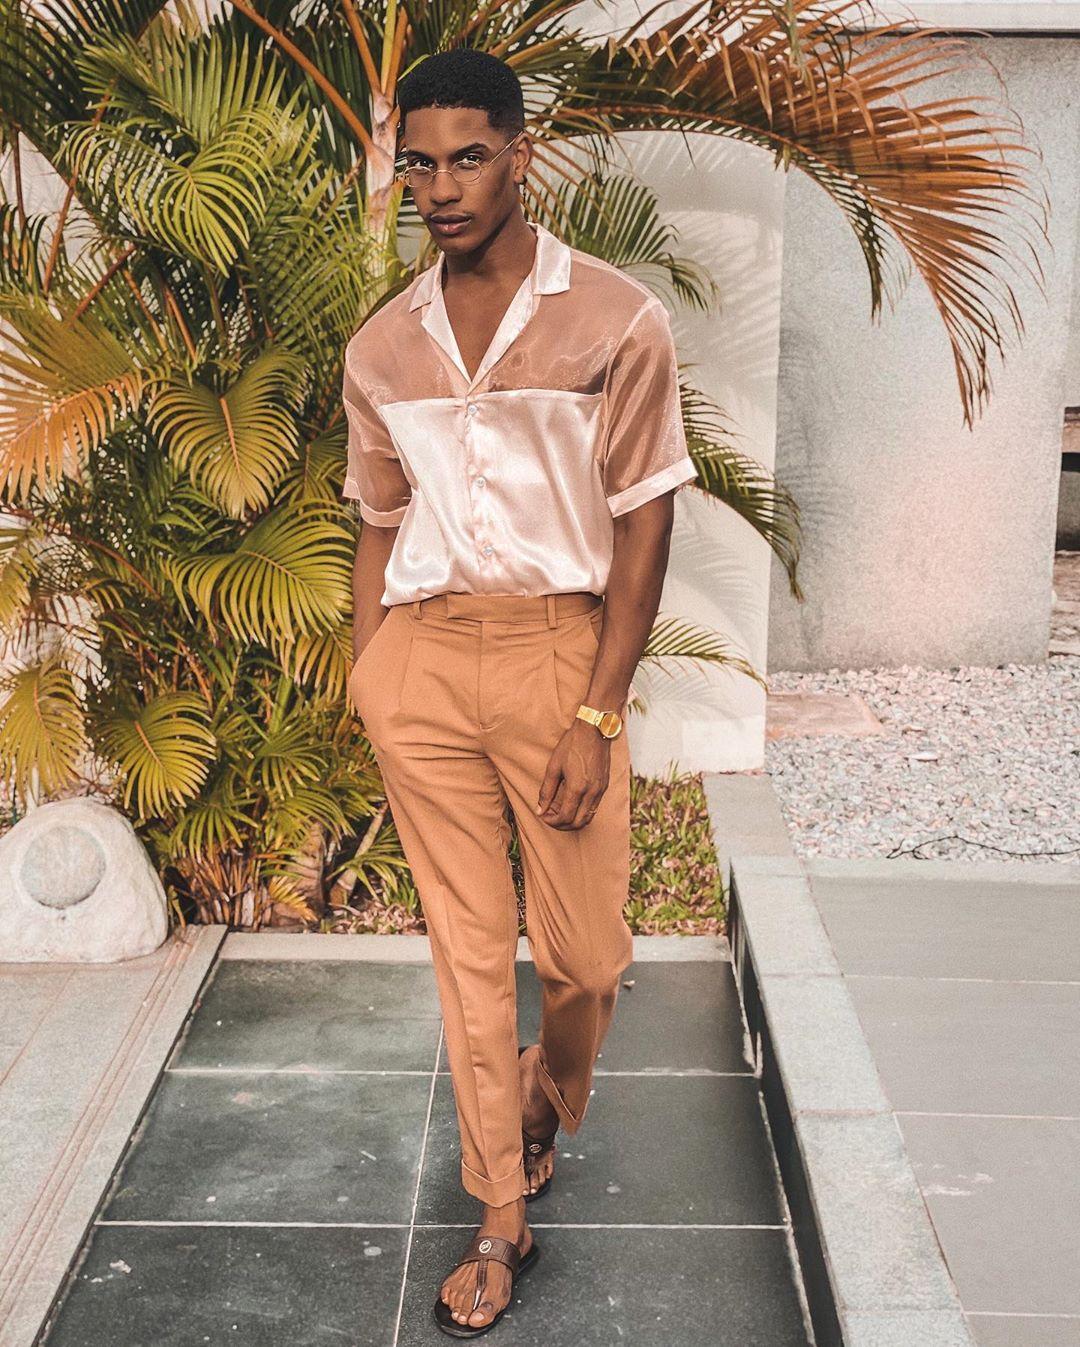 fashion-style-men-inspiration-africa-style-rave